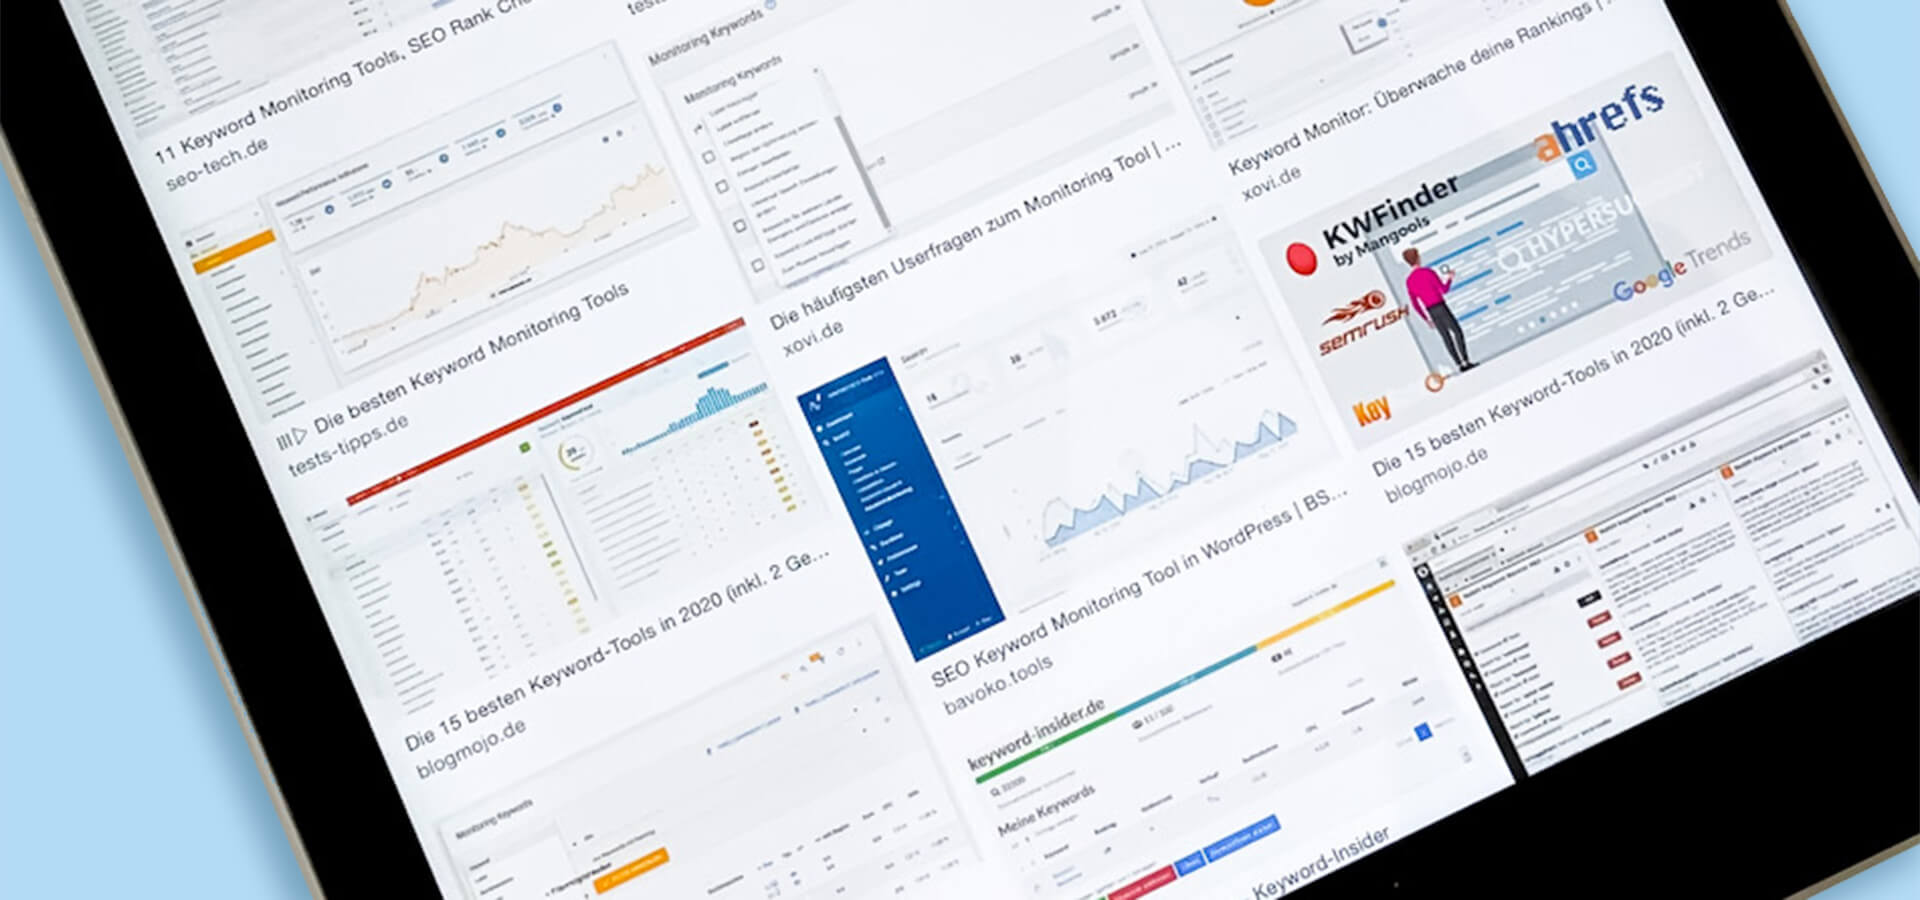 Keyword-Tool und Monitoring-Tool